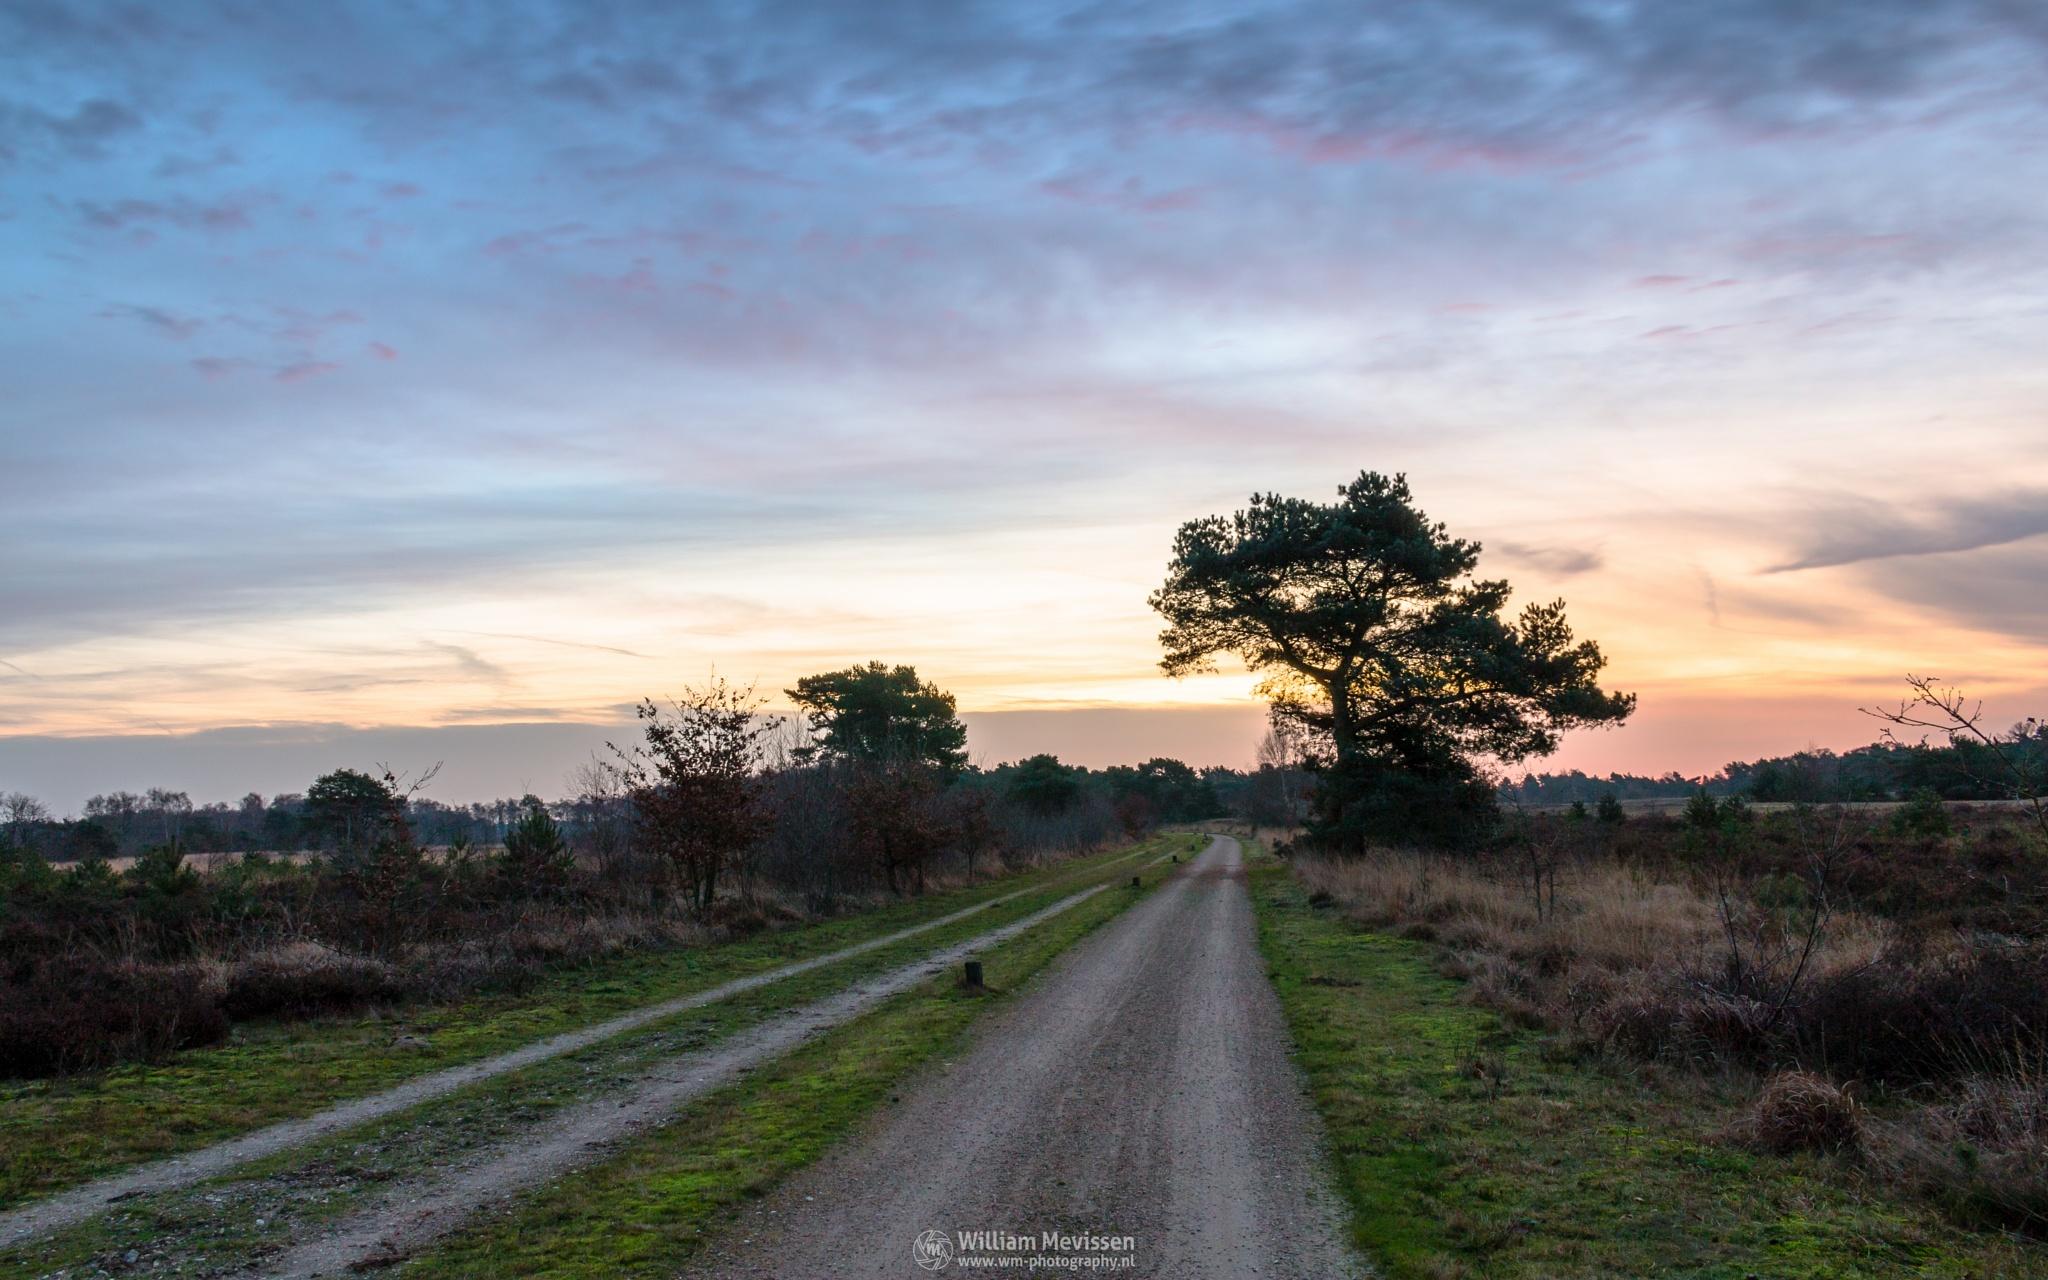 Photo in Landscape #bergerheide #heathland #forest #maasduinen #limburg #noord-limburg #woods #nieuw-bergen #bergen #national park #nature #sand #tree #sky #clouds #purple #twilight #dawn #dirt road #road #bend #path #trees #sanddunes #dunes